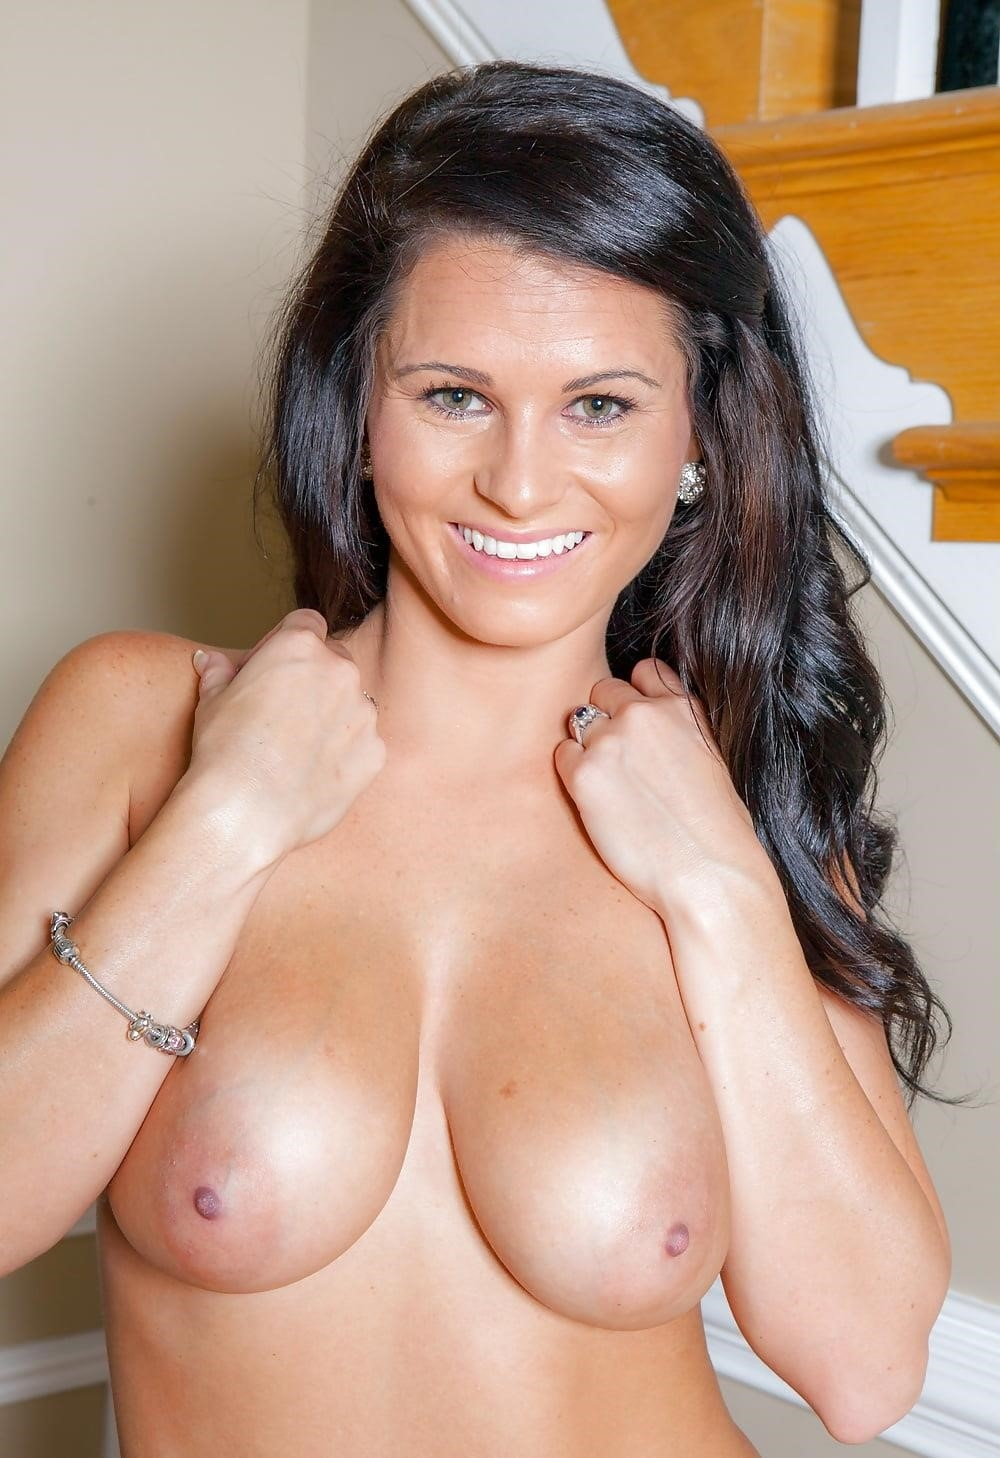 Big tits sheer lingerie-6461